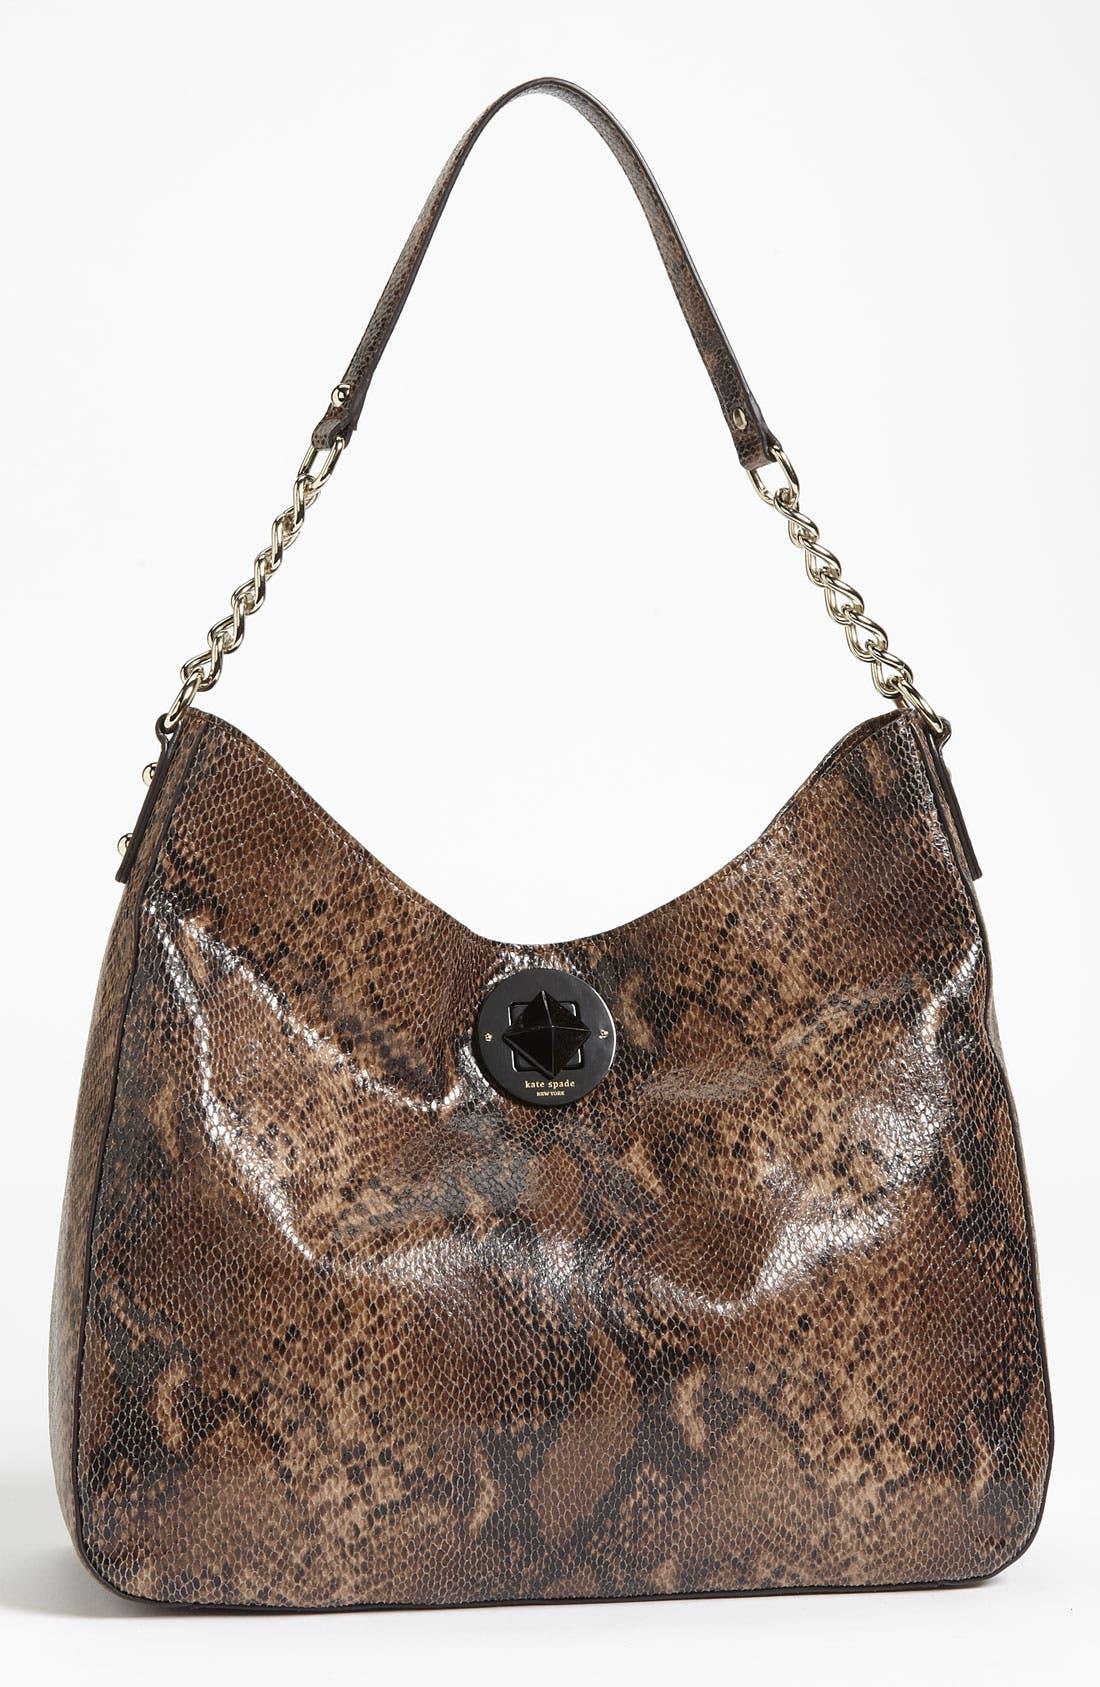 Alternate Image 1 Selected - kate spade new york 'south kensington - janica' shoulder bag